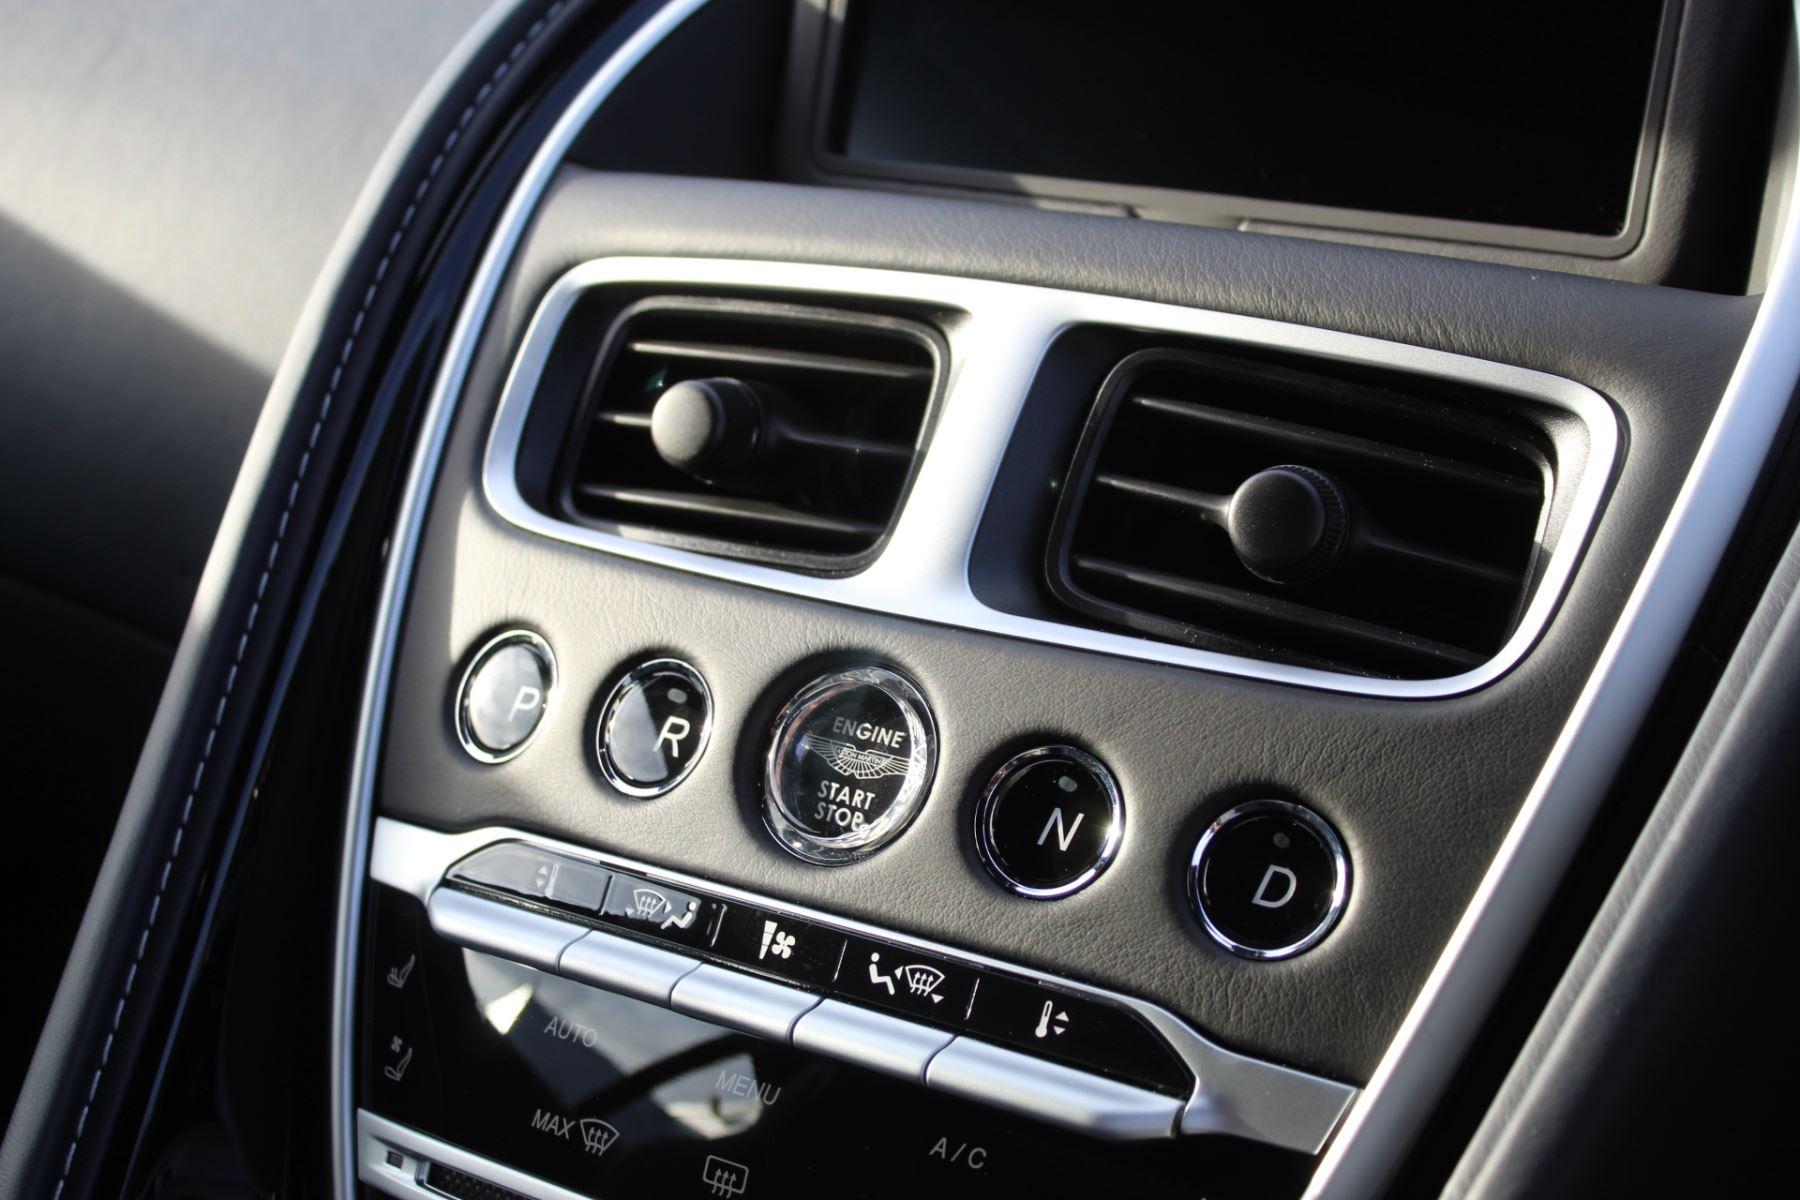 Aston Martin DBS Superleggera V12 2dr Touchtronic image 12